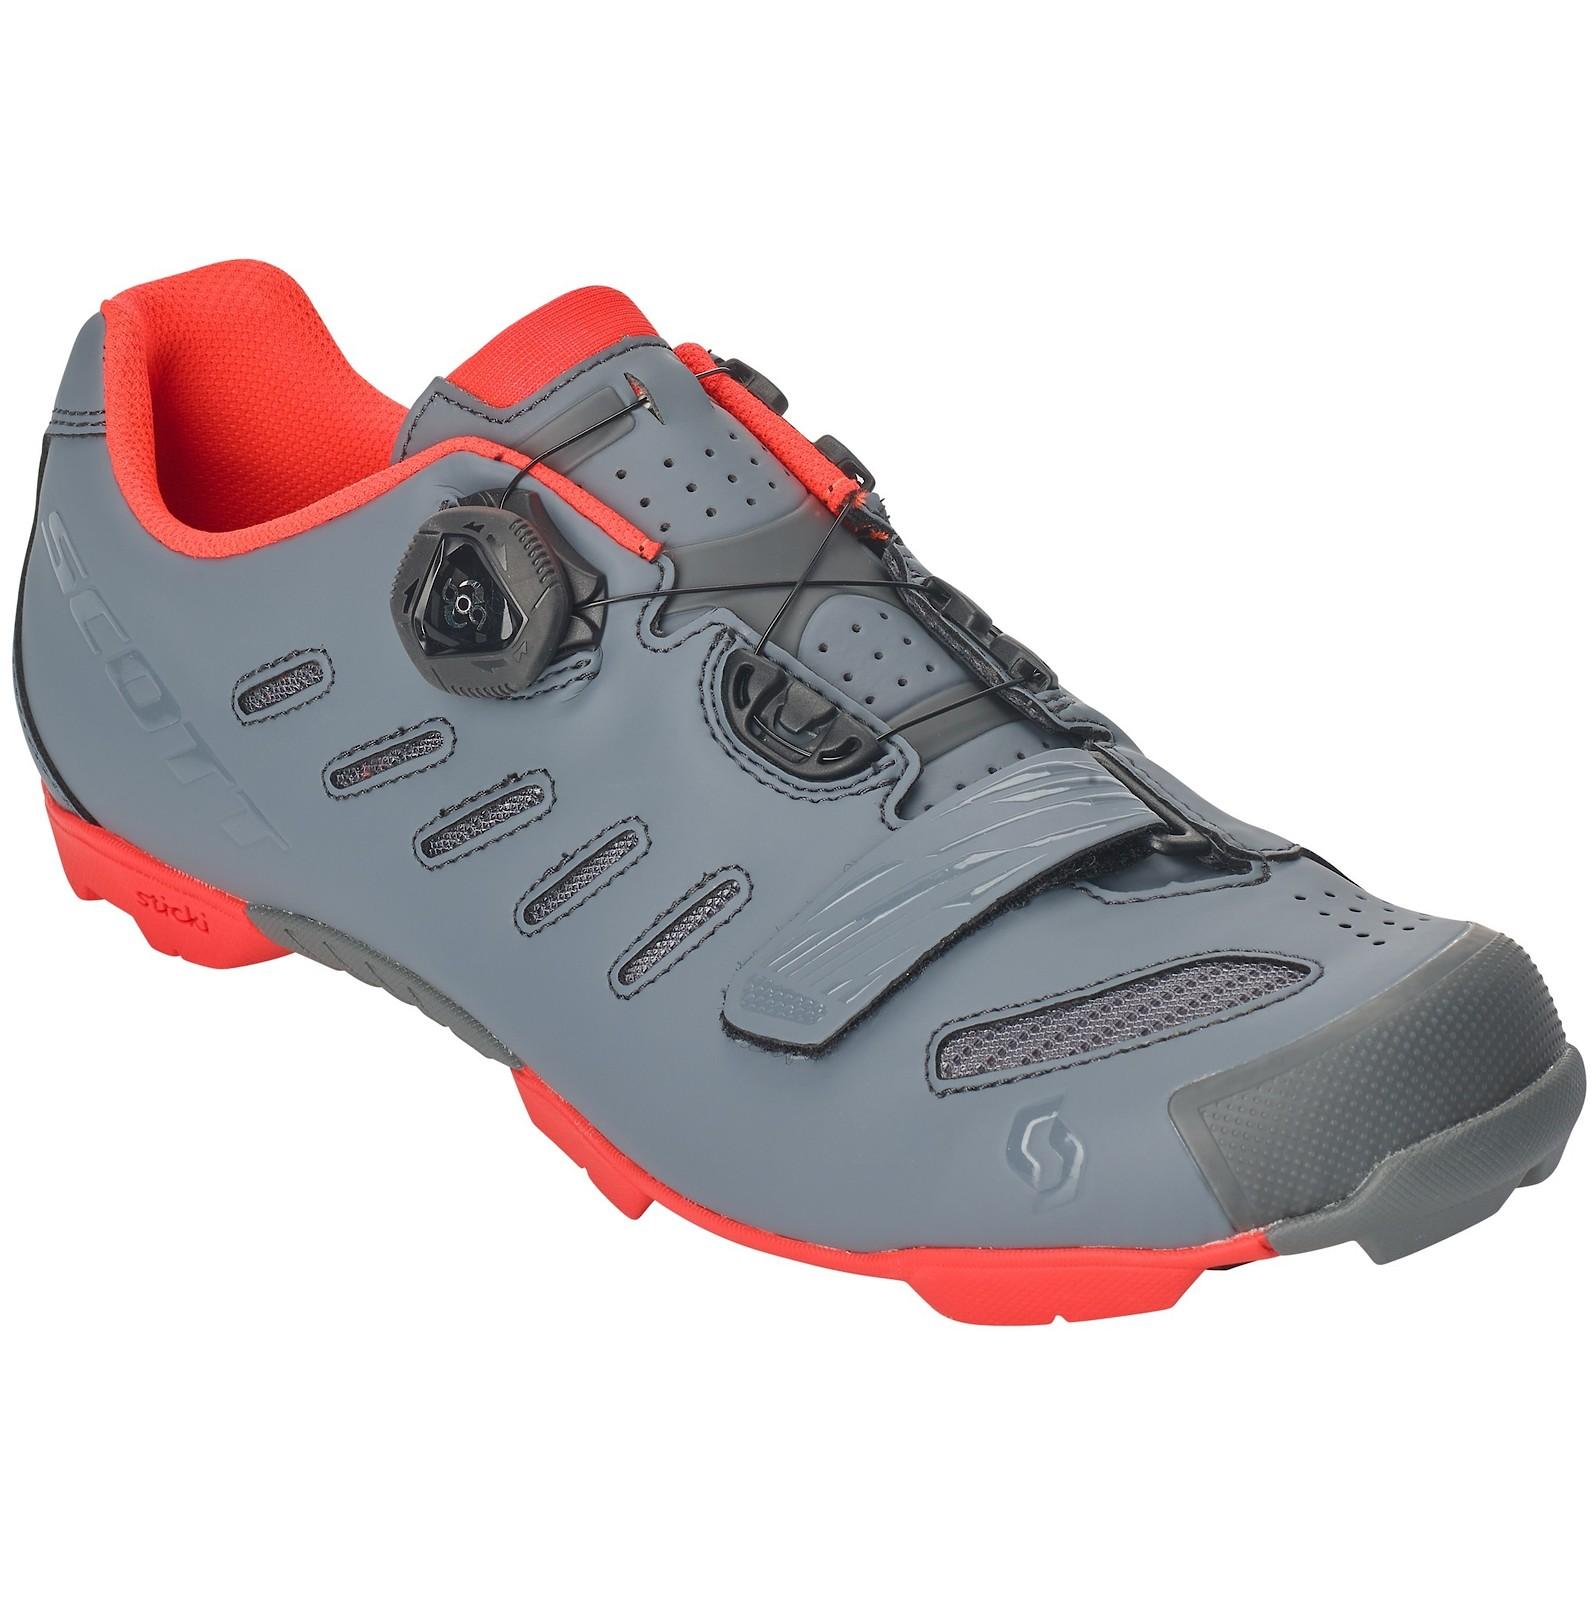 Scott Team Boa shoe in cool grey/neon orange